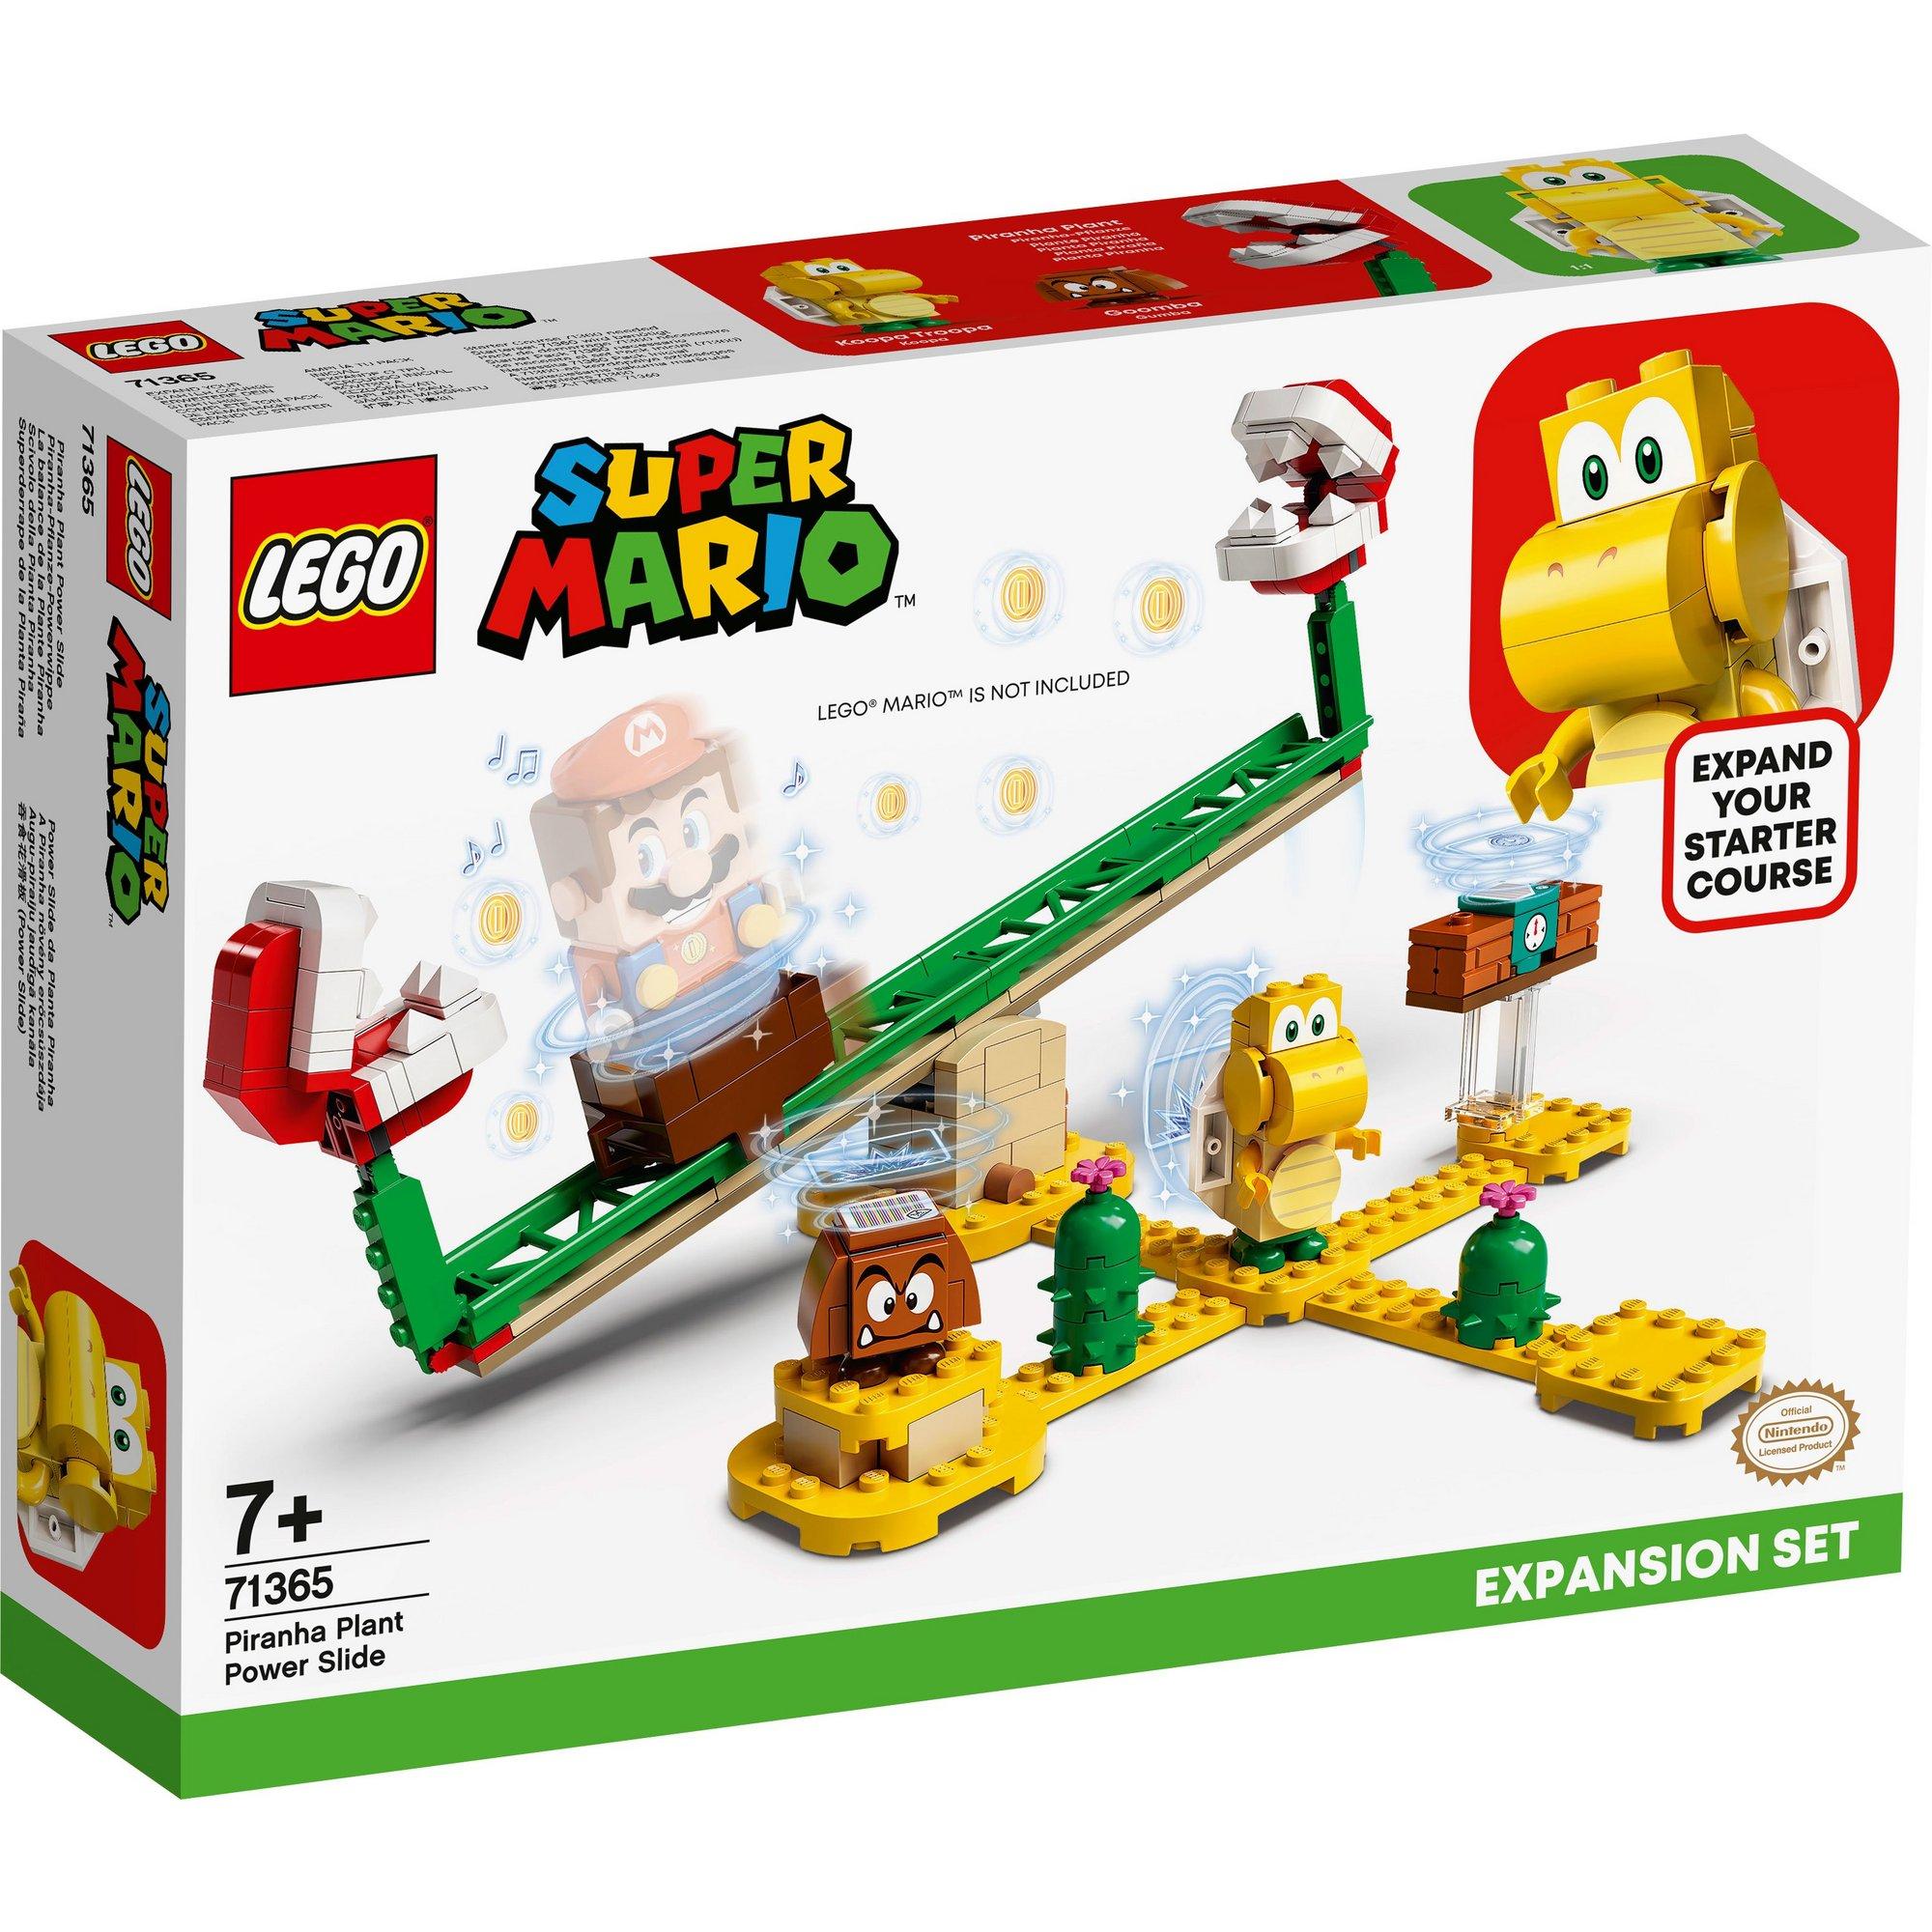 Image of LEGO Super Mario Piranha Plant Power Slide Expansion Set